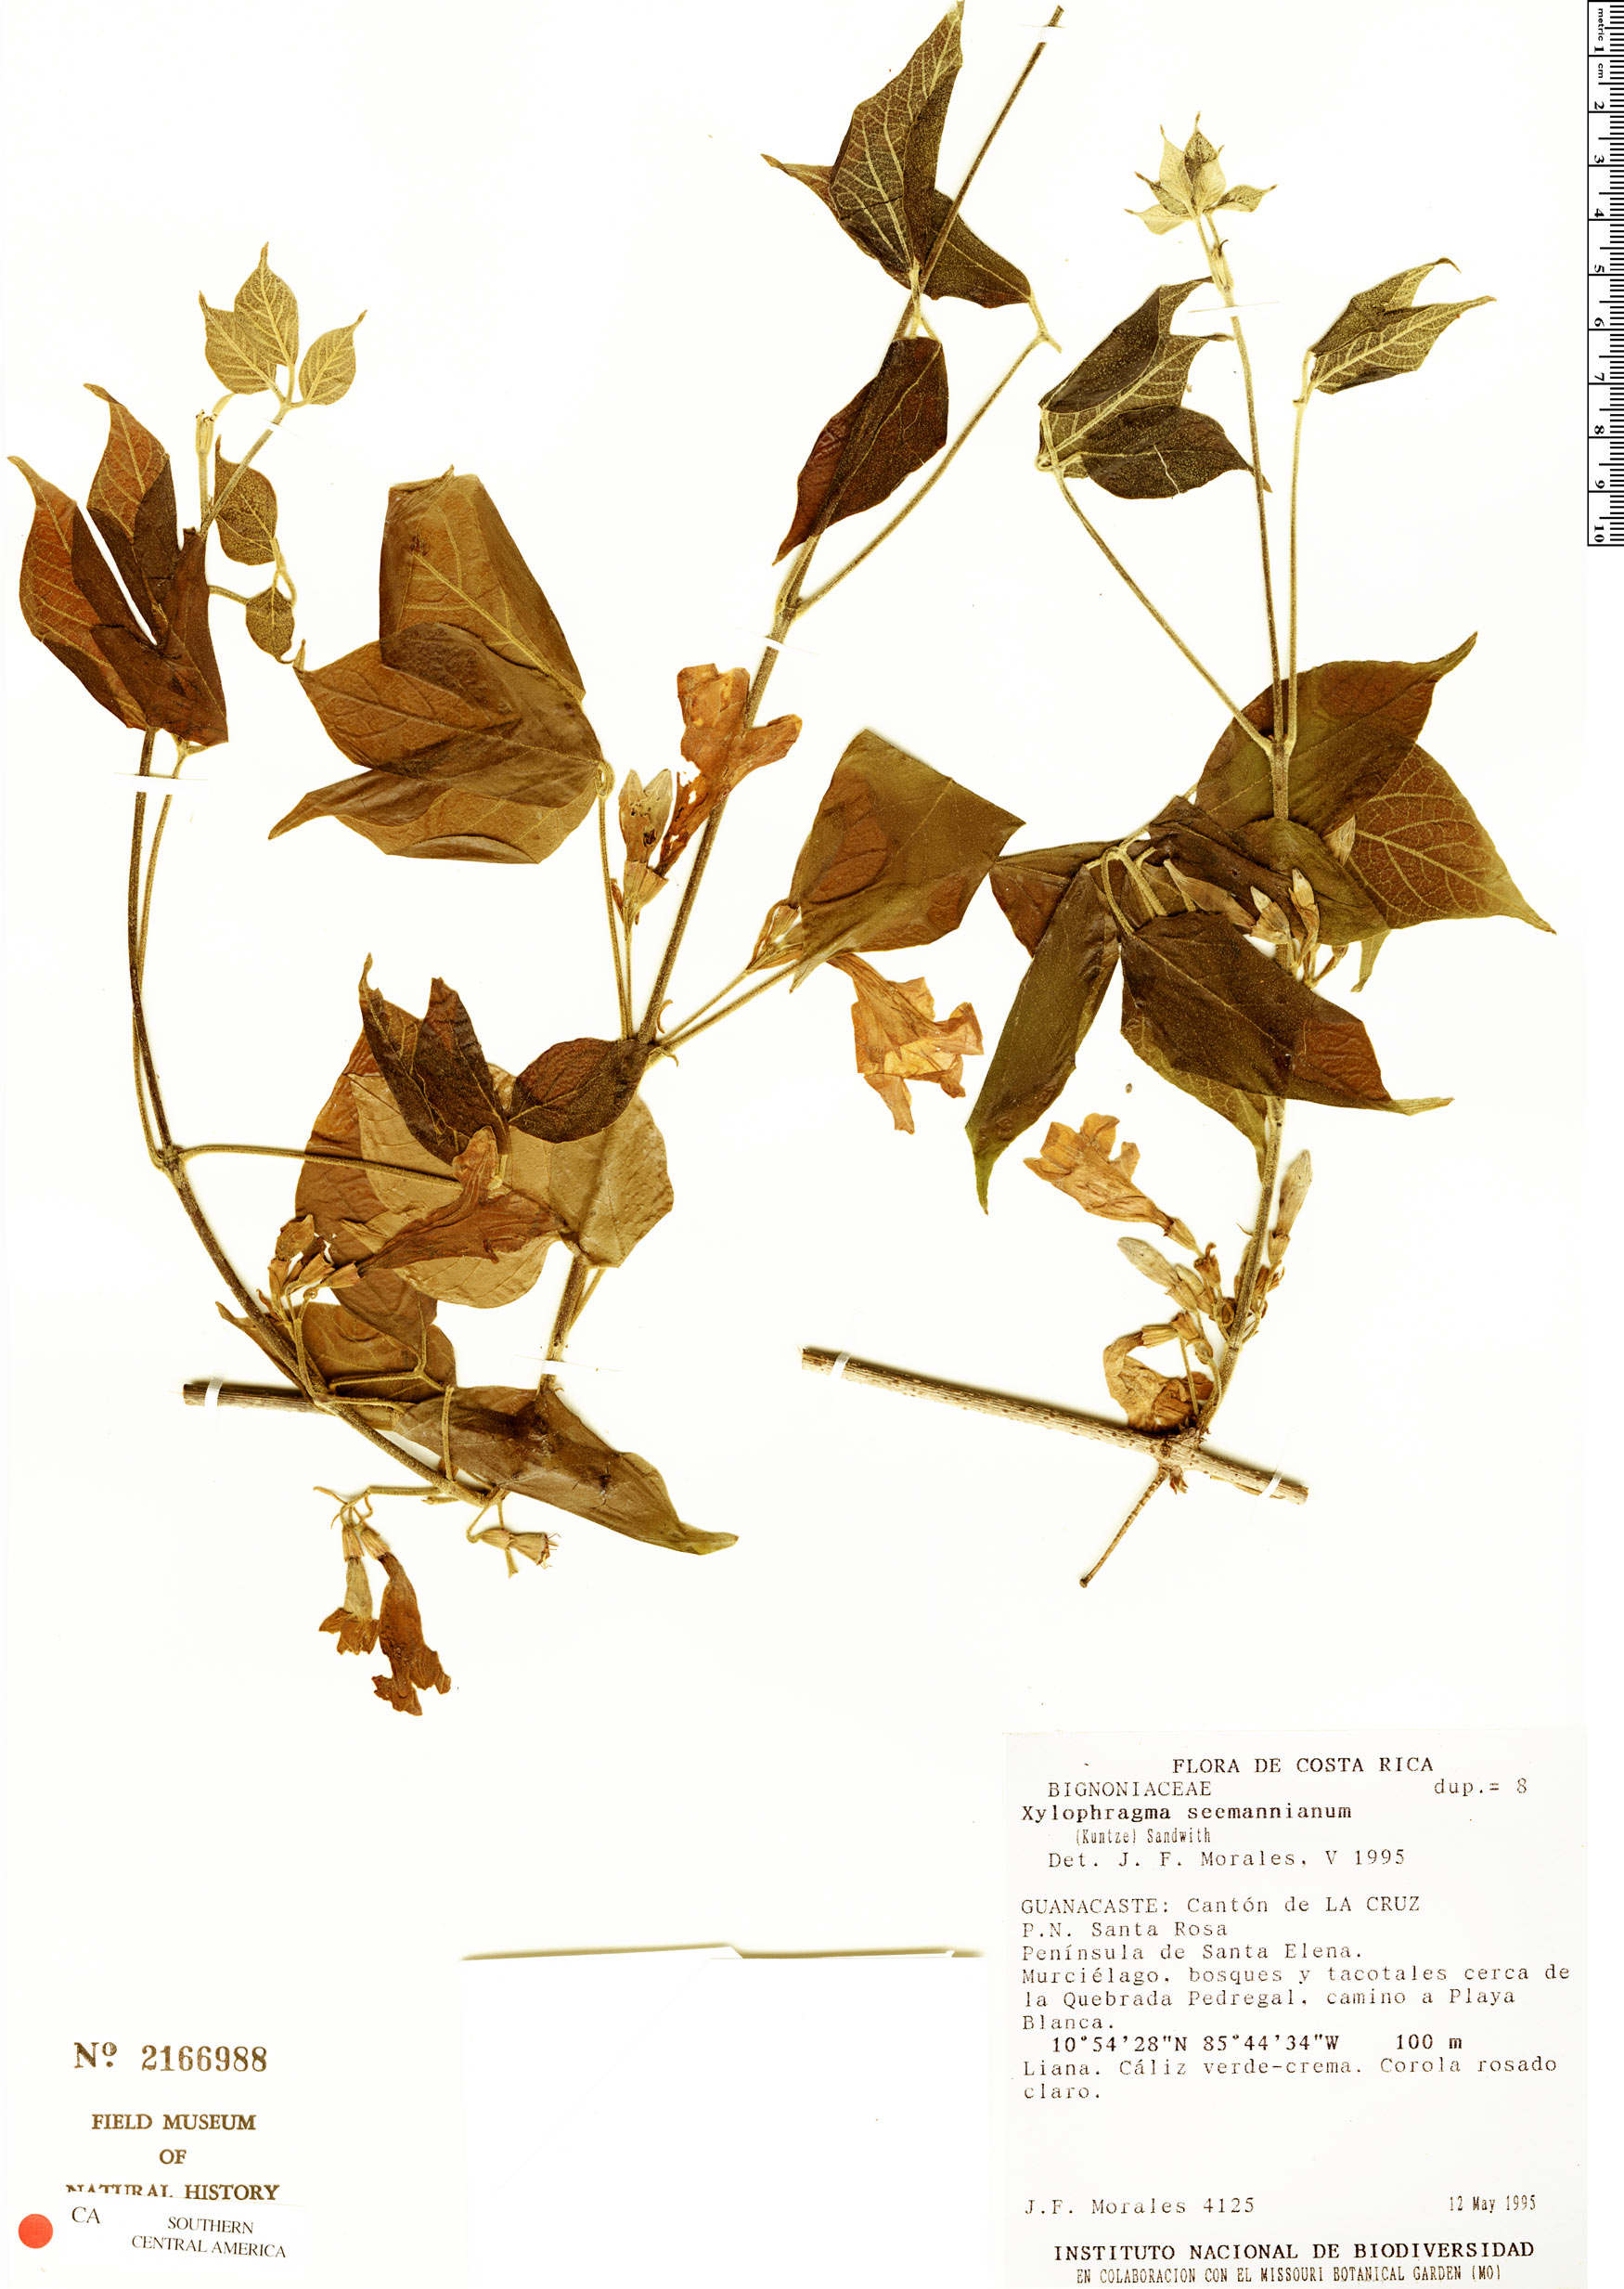 Specimen: Xylophragma seemannianum